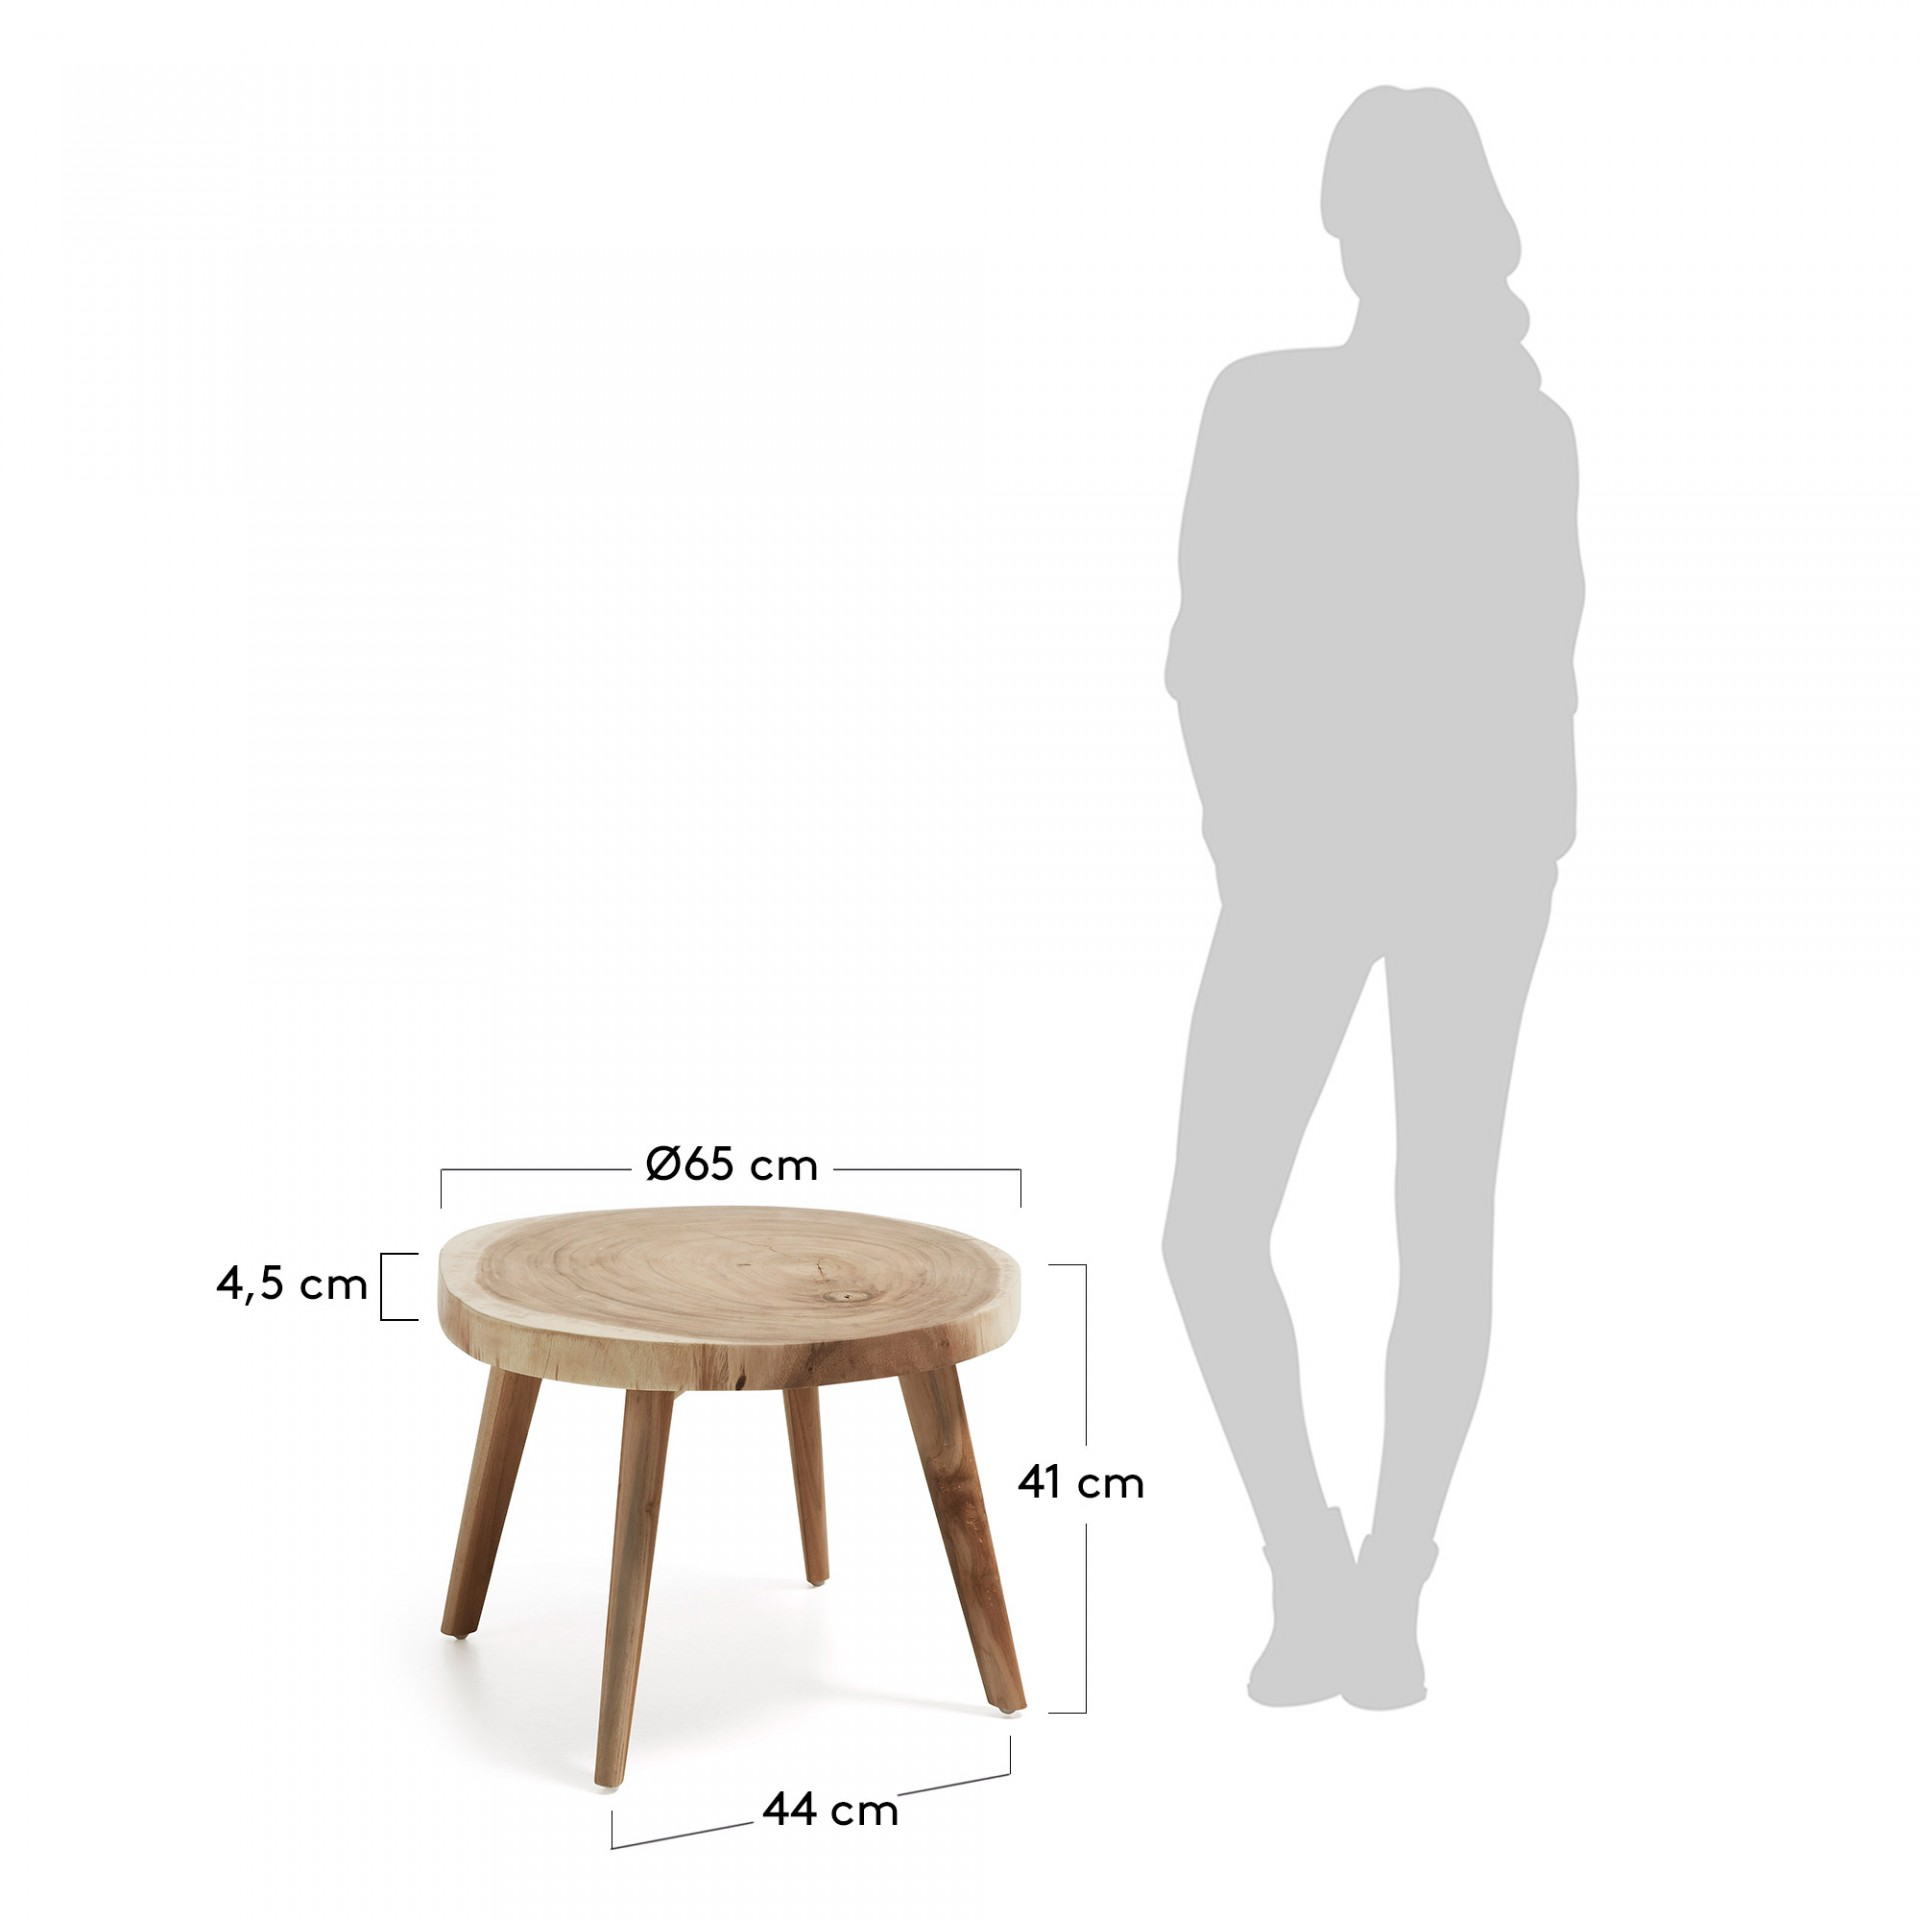 Mesa de apoio Weel, madeira Munggur natural, Ø65x41